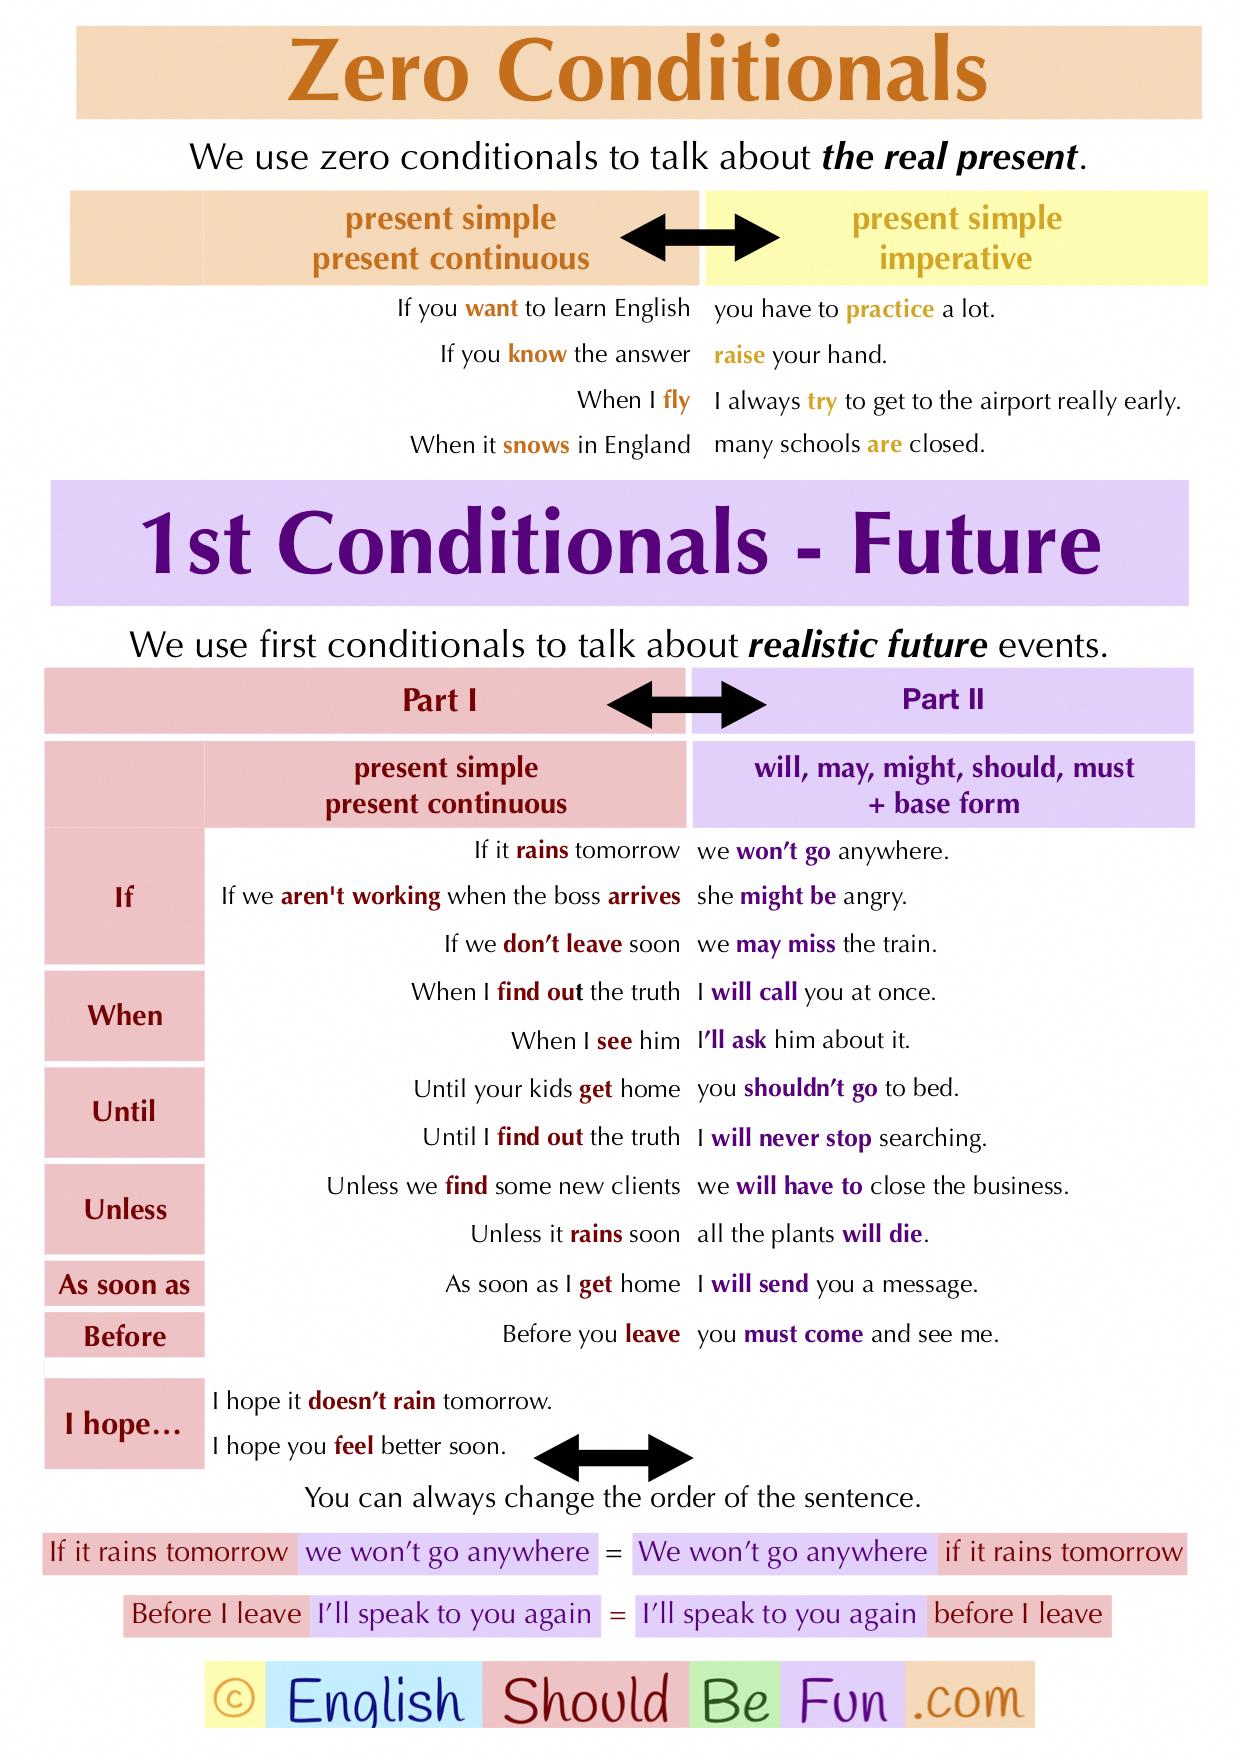 1st Conditionals